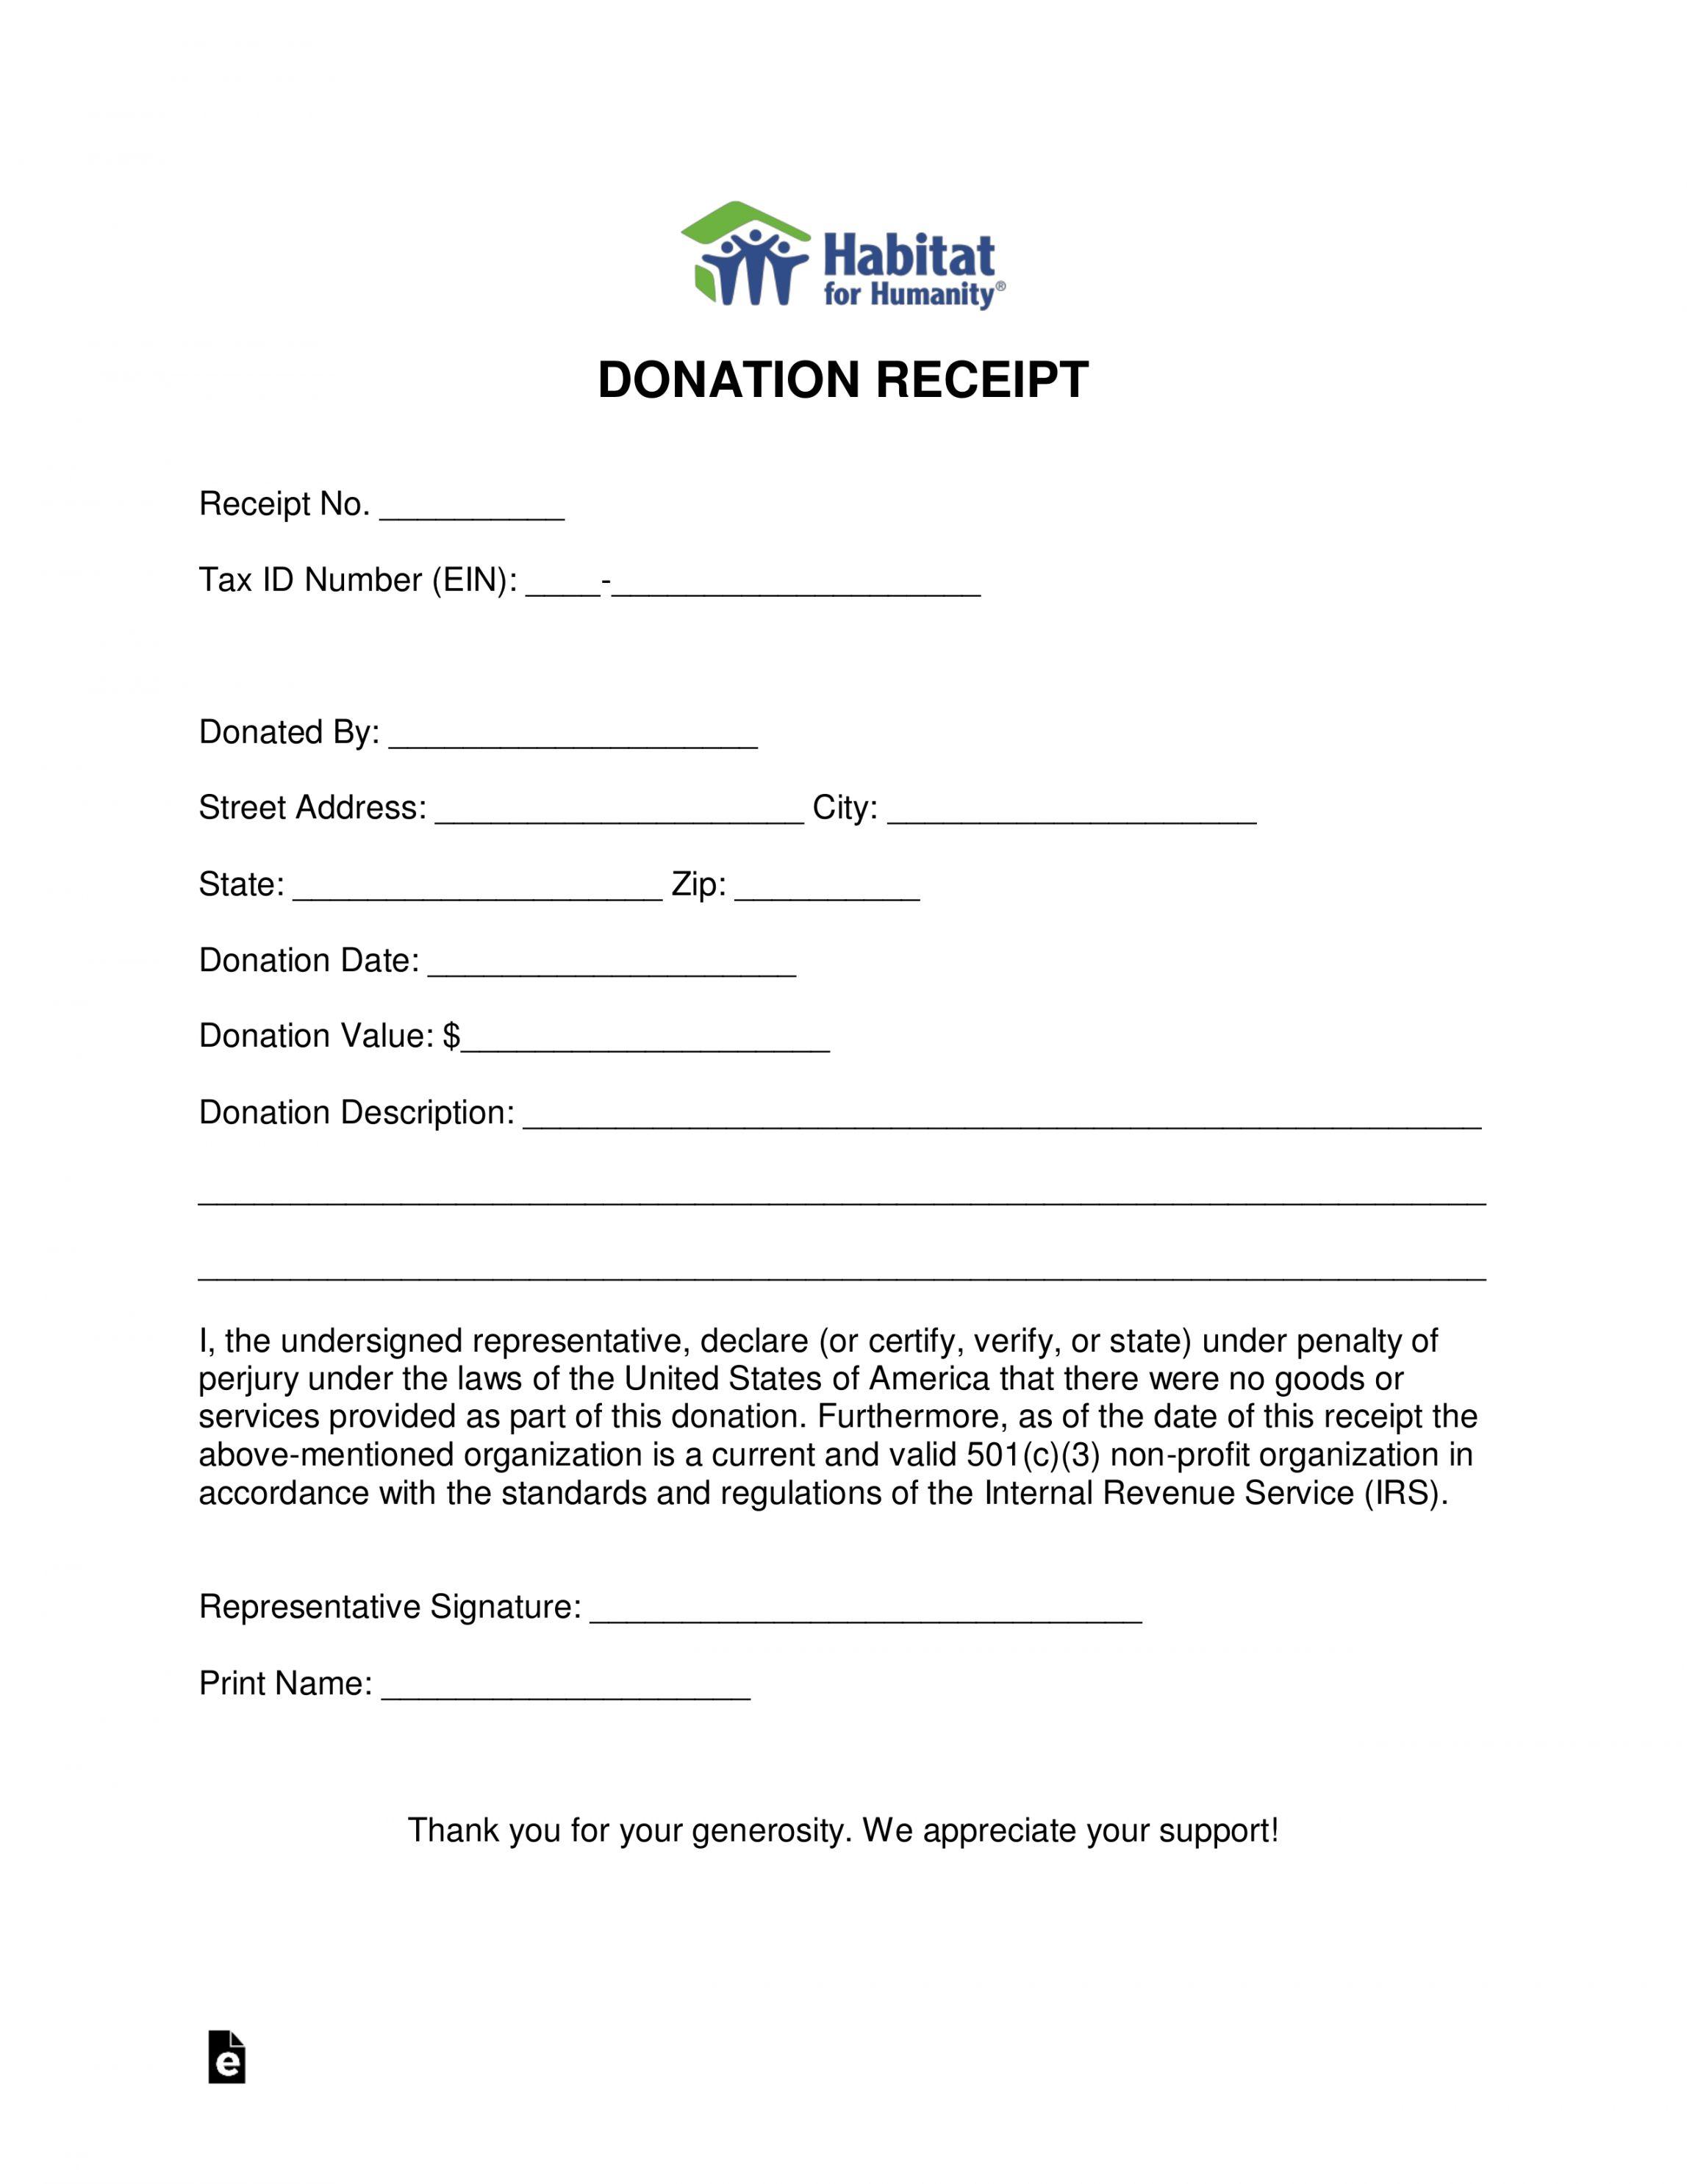 Explore Our Printable Furniture Donation Receipt Template Receipt Template Habitat For Humanity Receipt